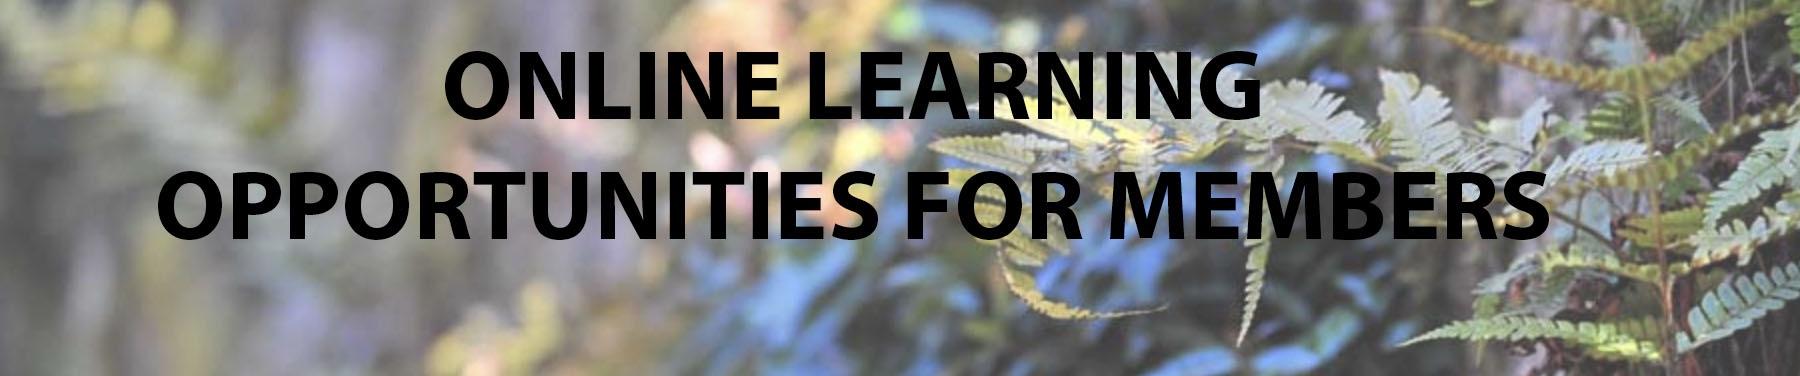 https://learning.unison.org.uk/2020/04/03/unison-skills-academy-free-online-learning/?fbclid=IwAR30e00BDn3-__0p3i00g2sKONCYWl2tJ1fJxHQC_u7dCZfkMAItqvnxeN8